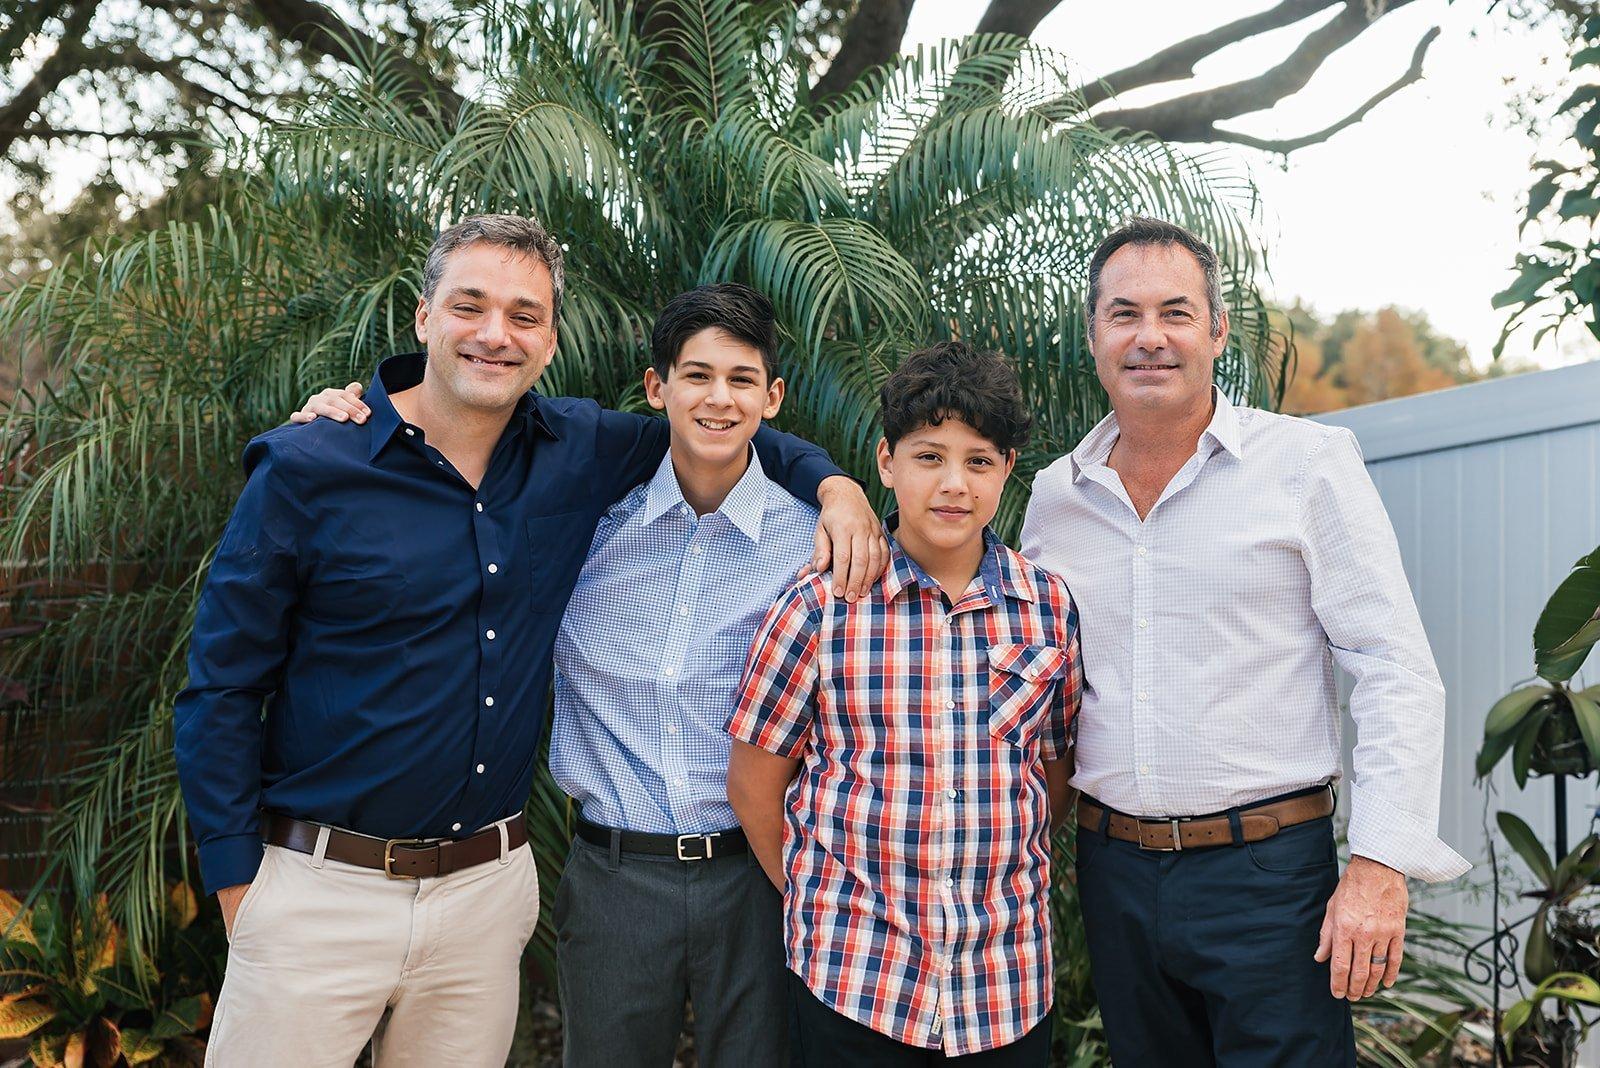 Dubocq Family Portraits